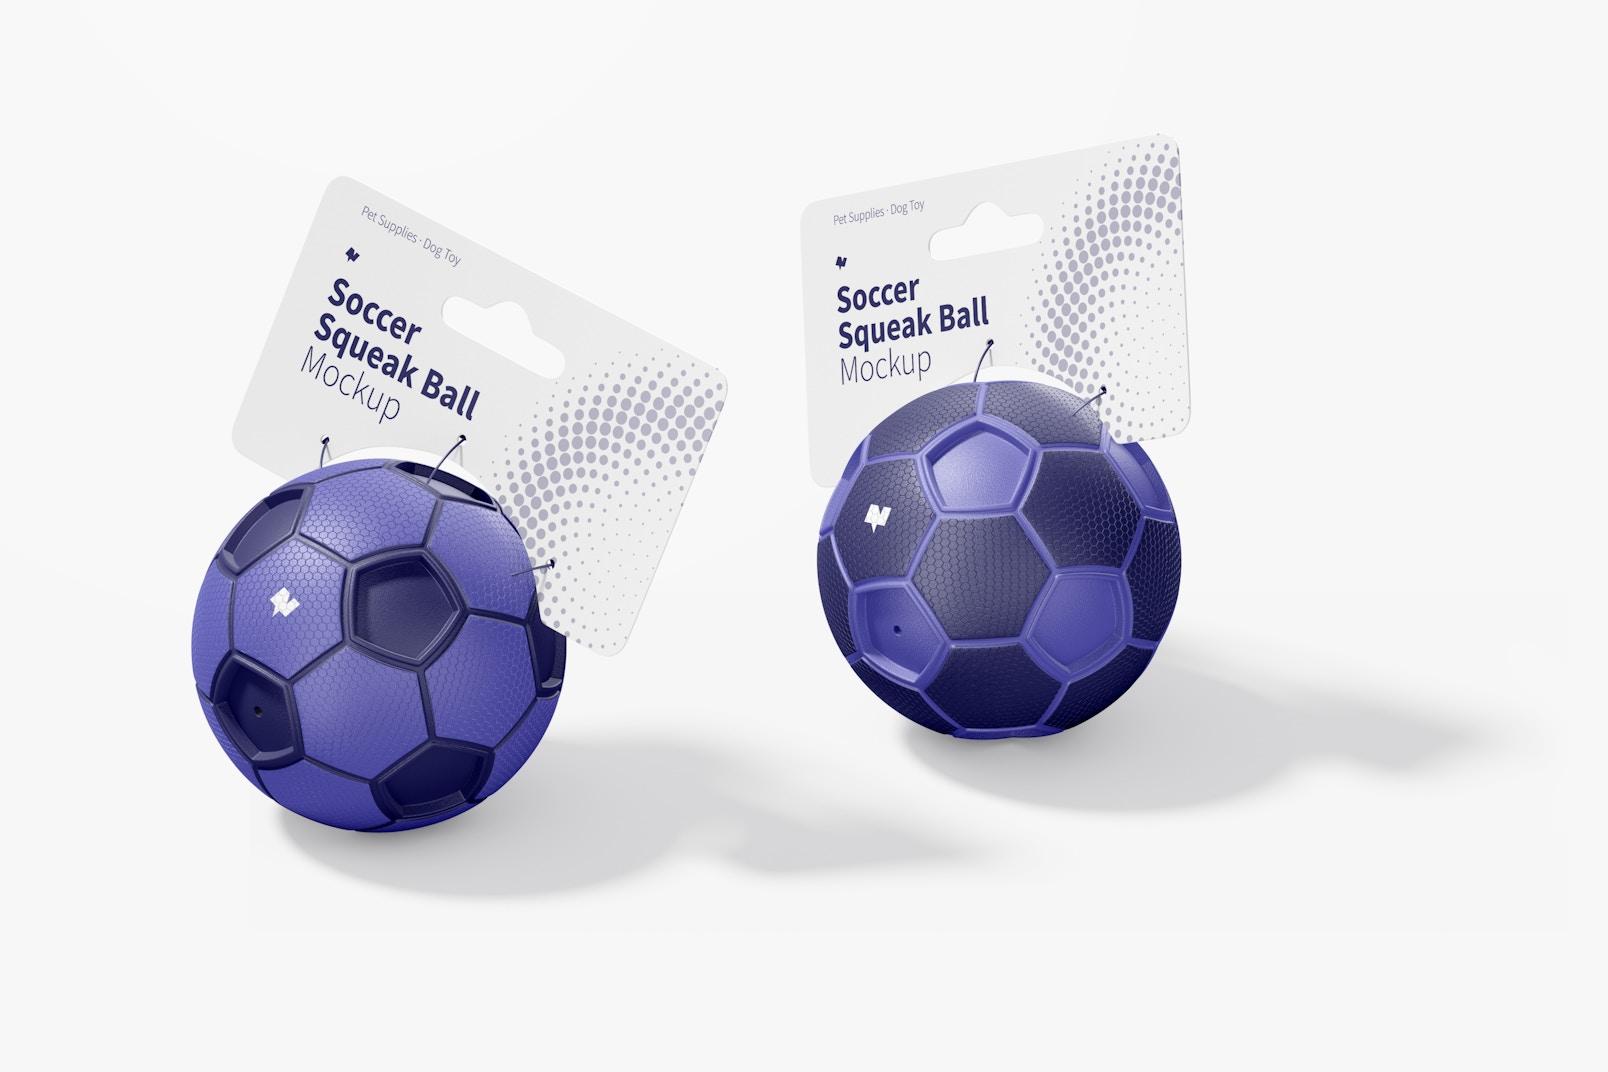 Soccer Squeak Balls Mockup, Left View